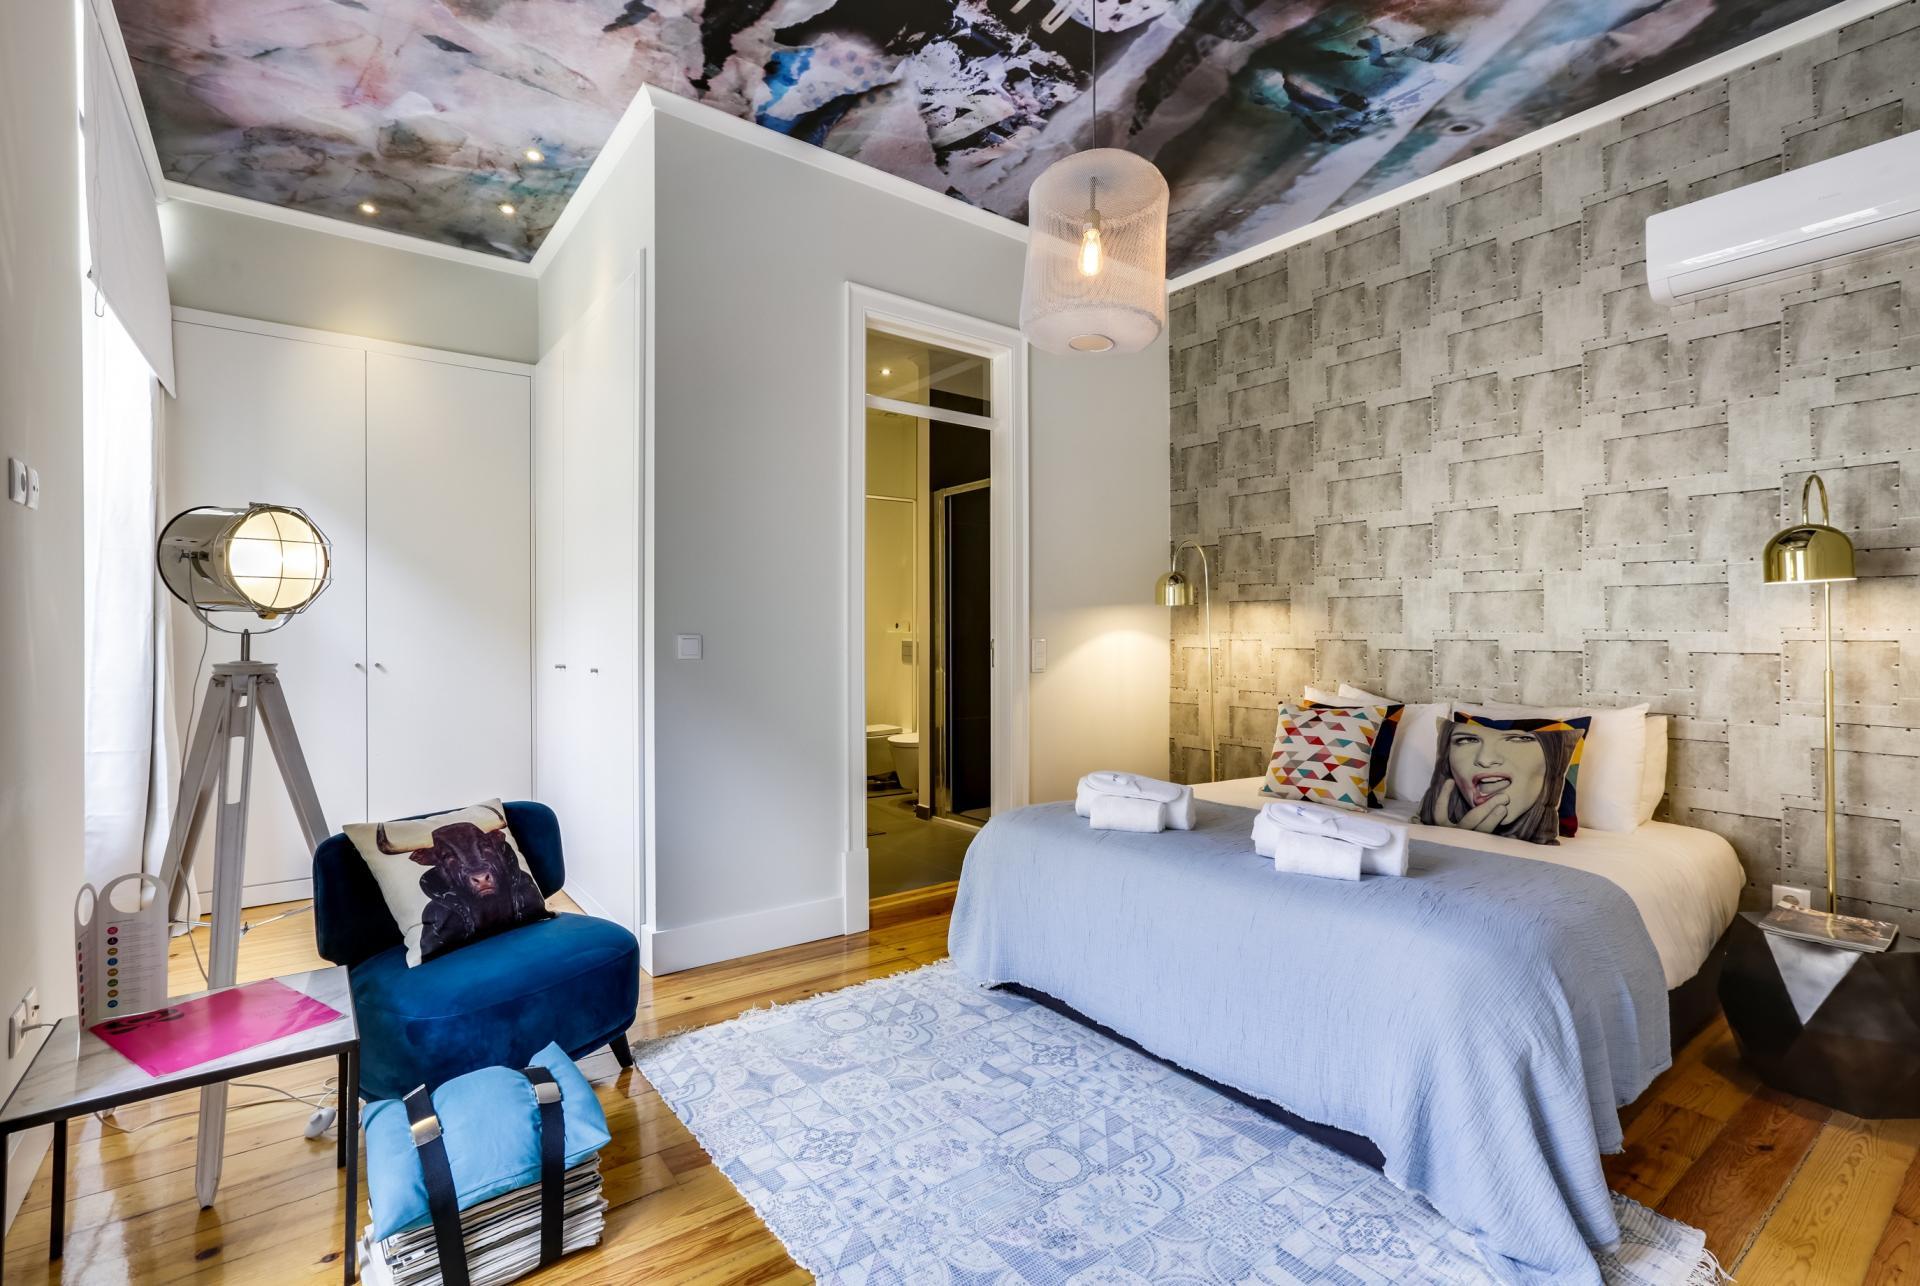 Stylish bedroo at Prata Apartments - Citybase Apartments